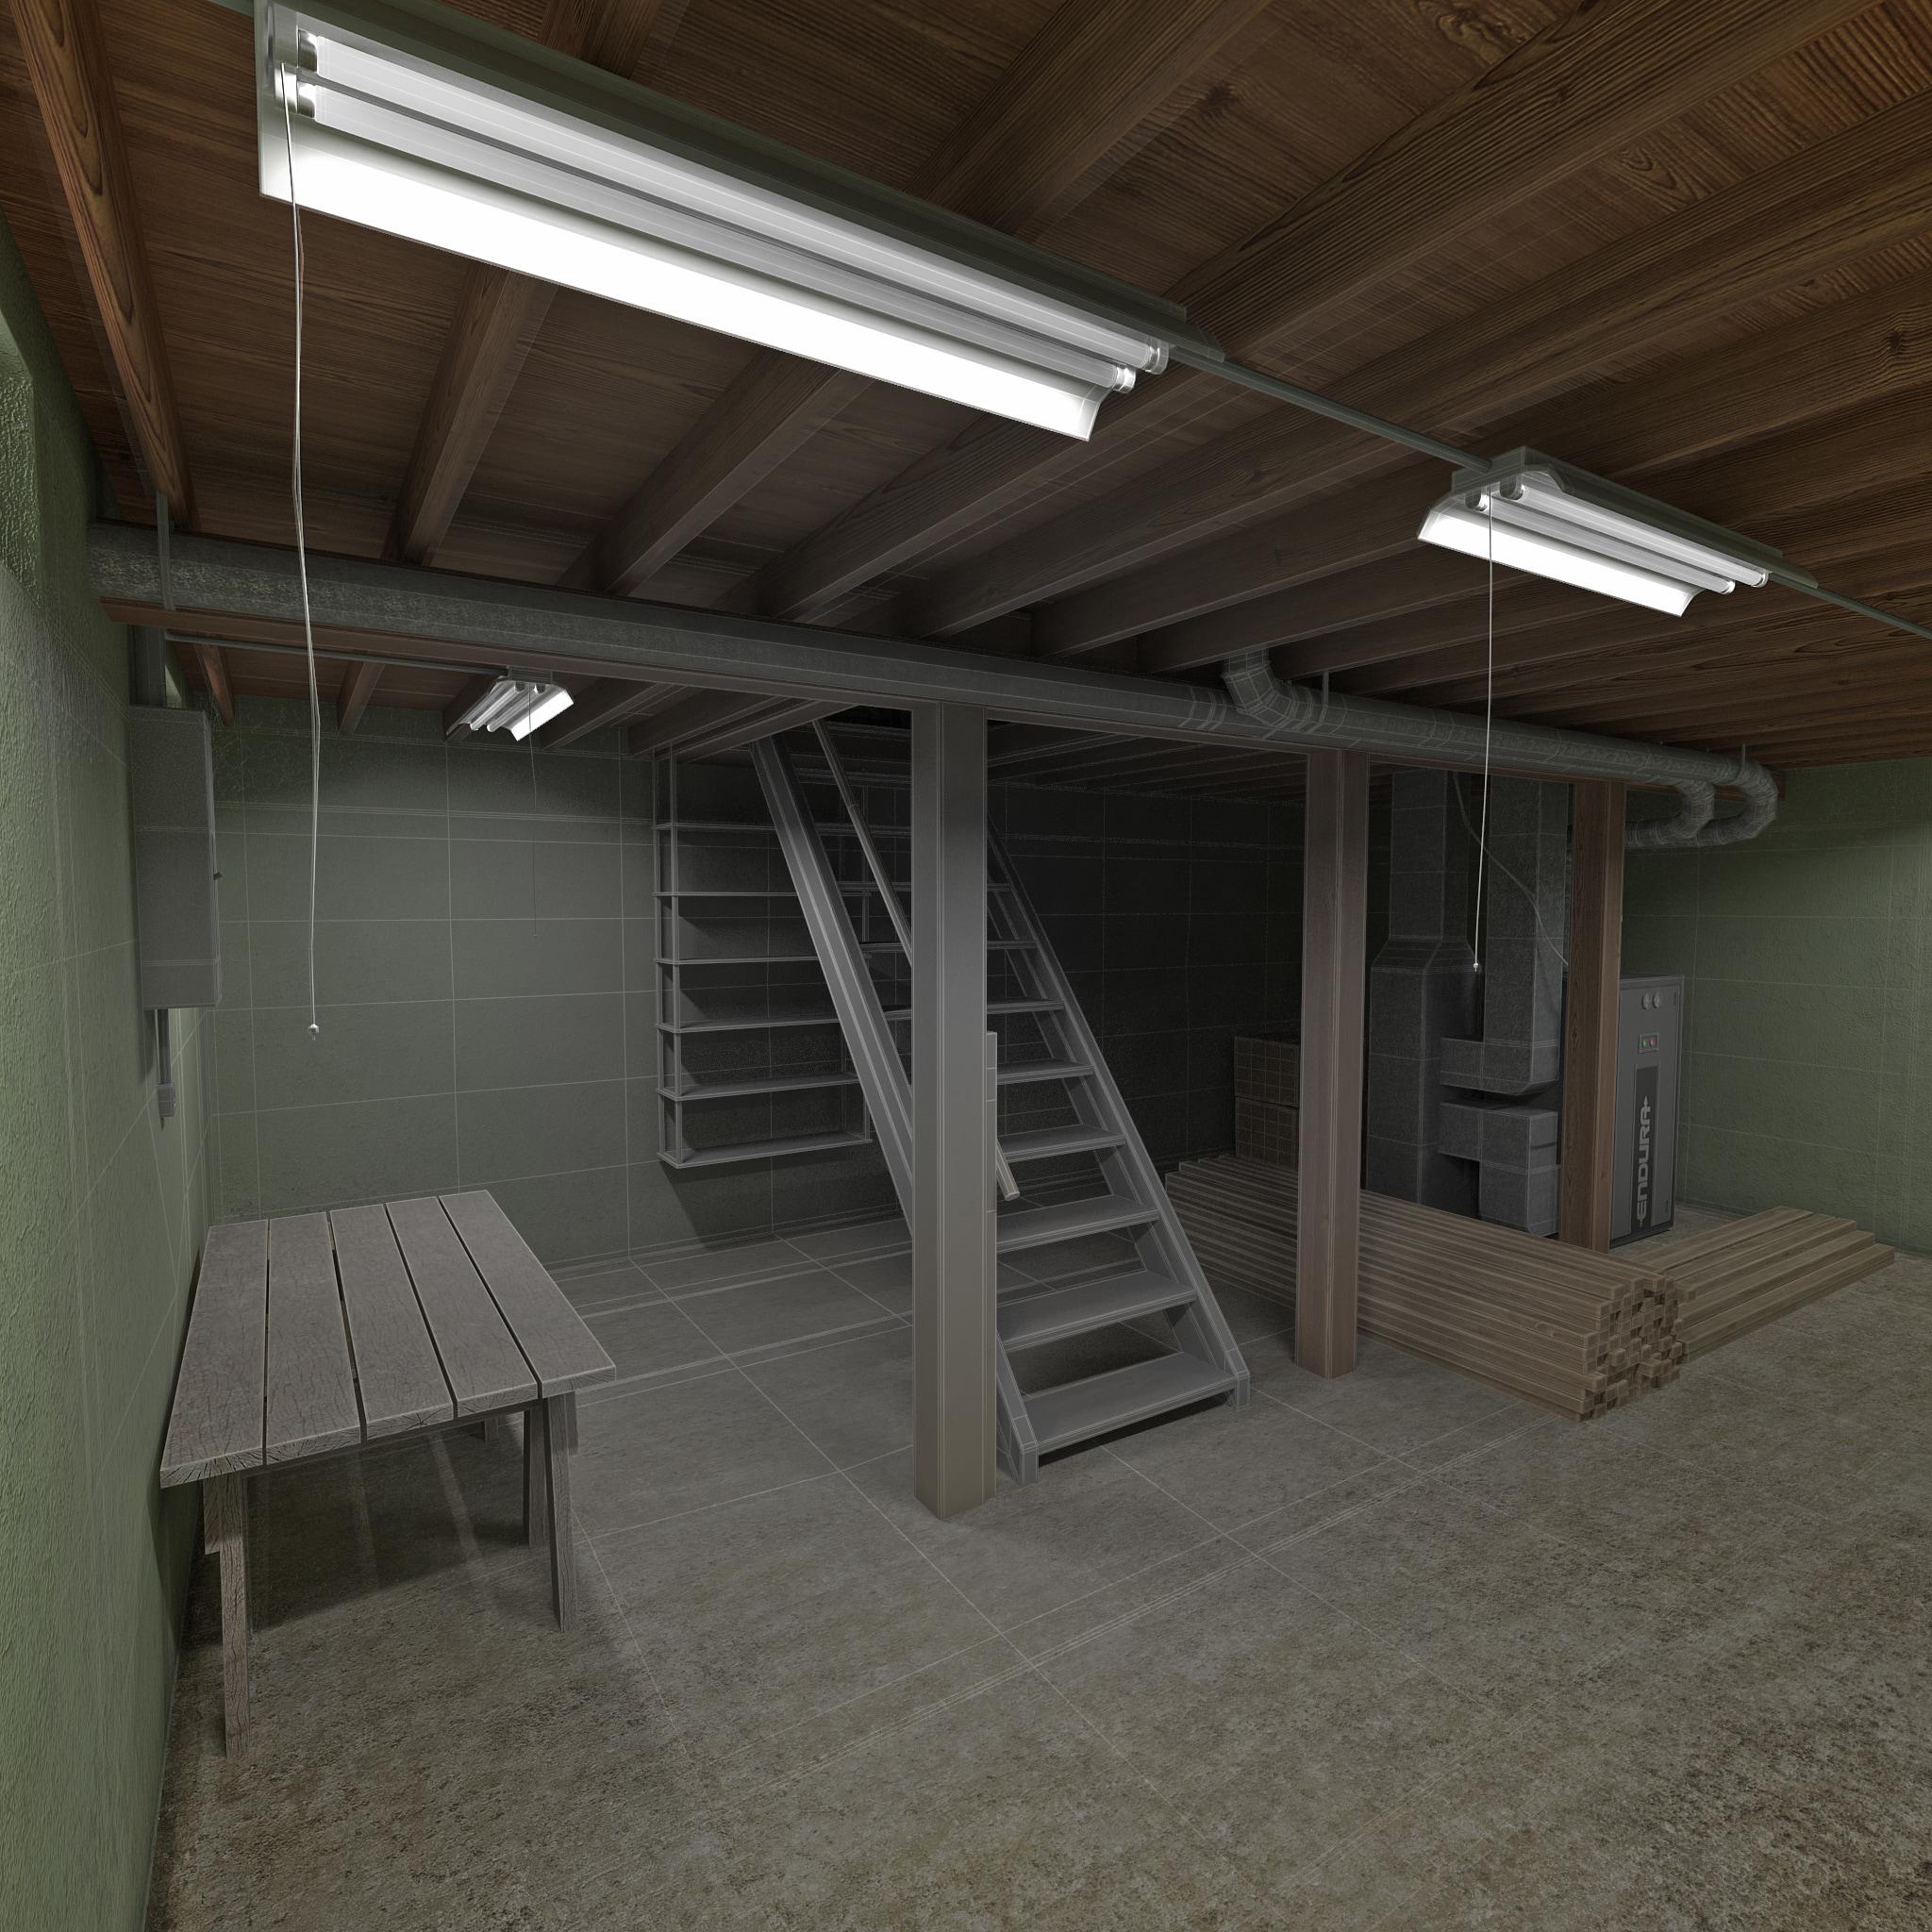 House Basement_8.jpg